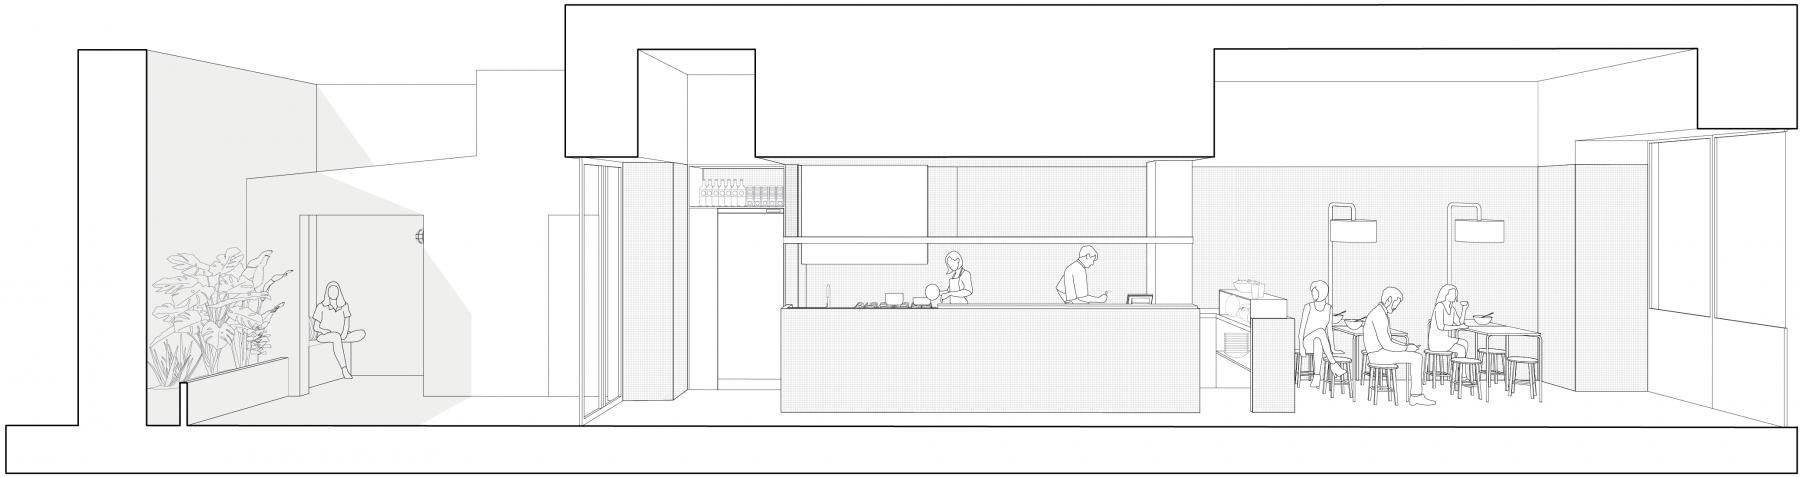 dc ad sun tan architecture section